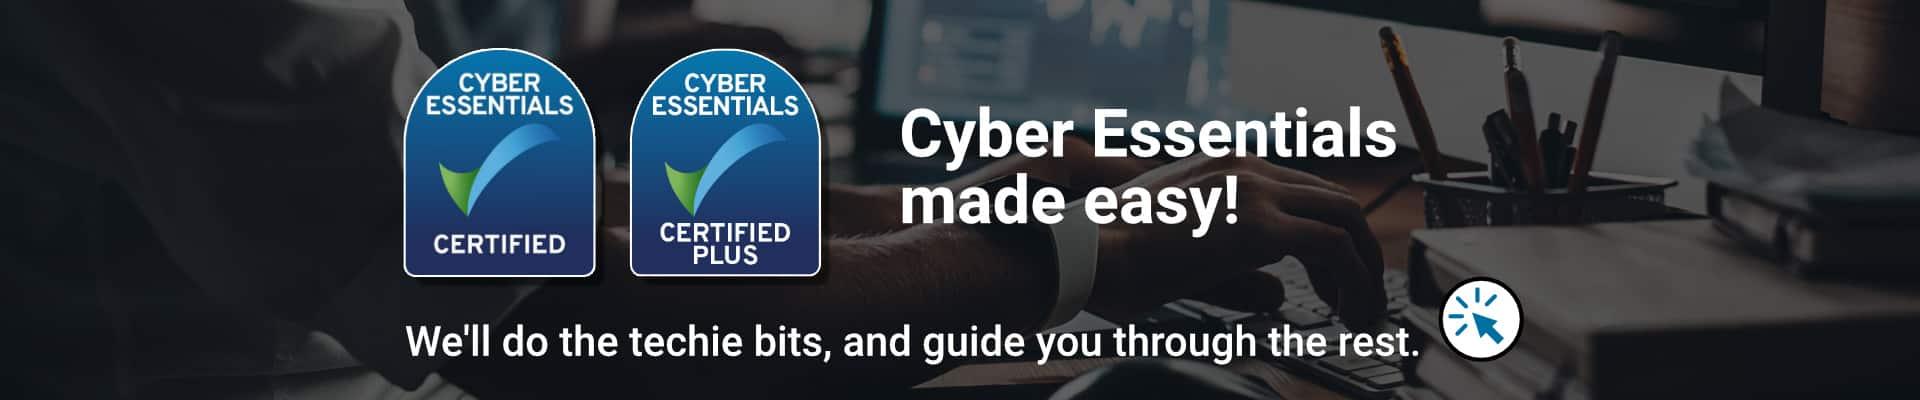 Cyber Essentials Self Assessment